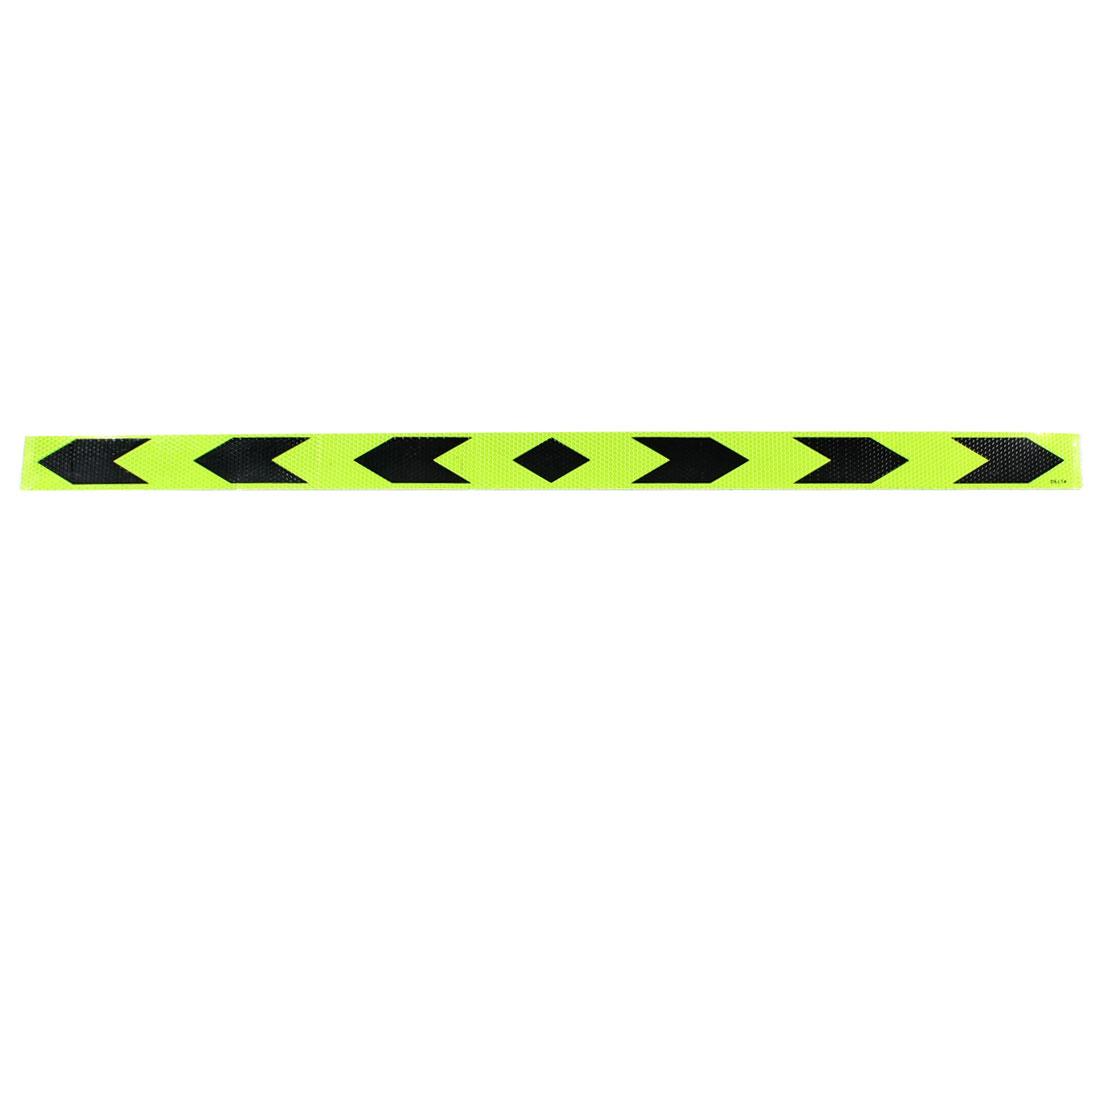 Plastic Adhesive Auto Car Reflective Tape Stripe Safety Sticker 90cm x 5cm